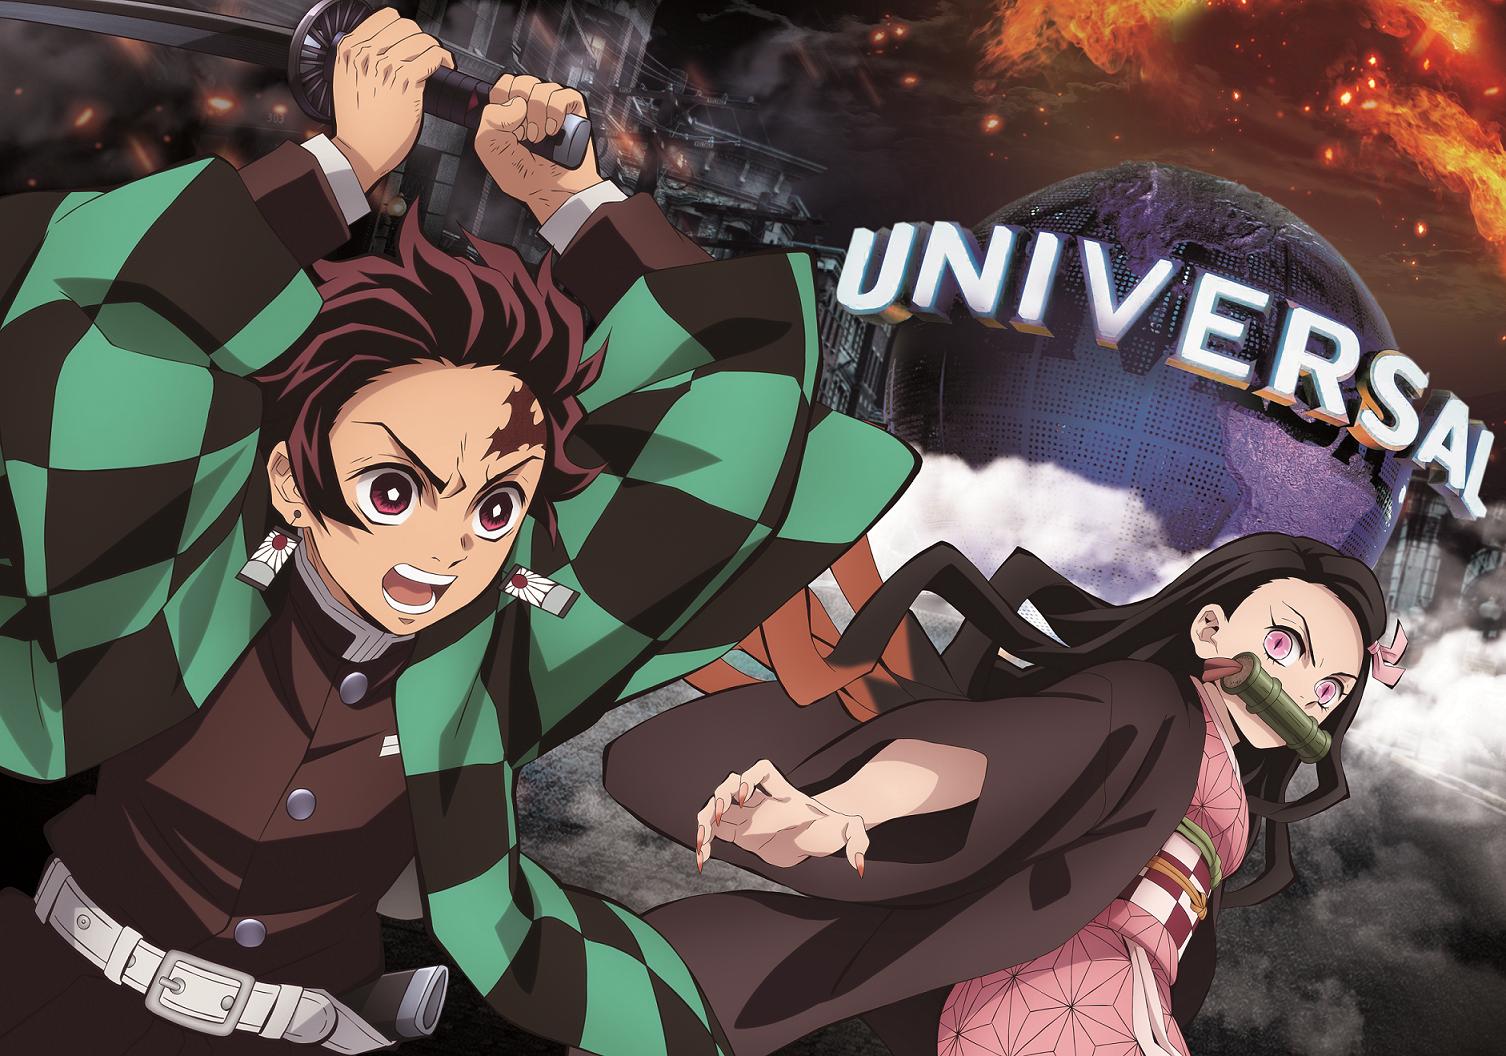 Demon Slayer: Kimetsu no Yaiba Attraction to Open at Universal StudiosJapan